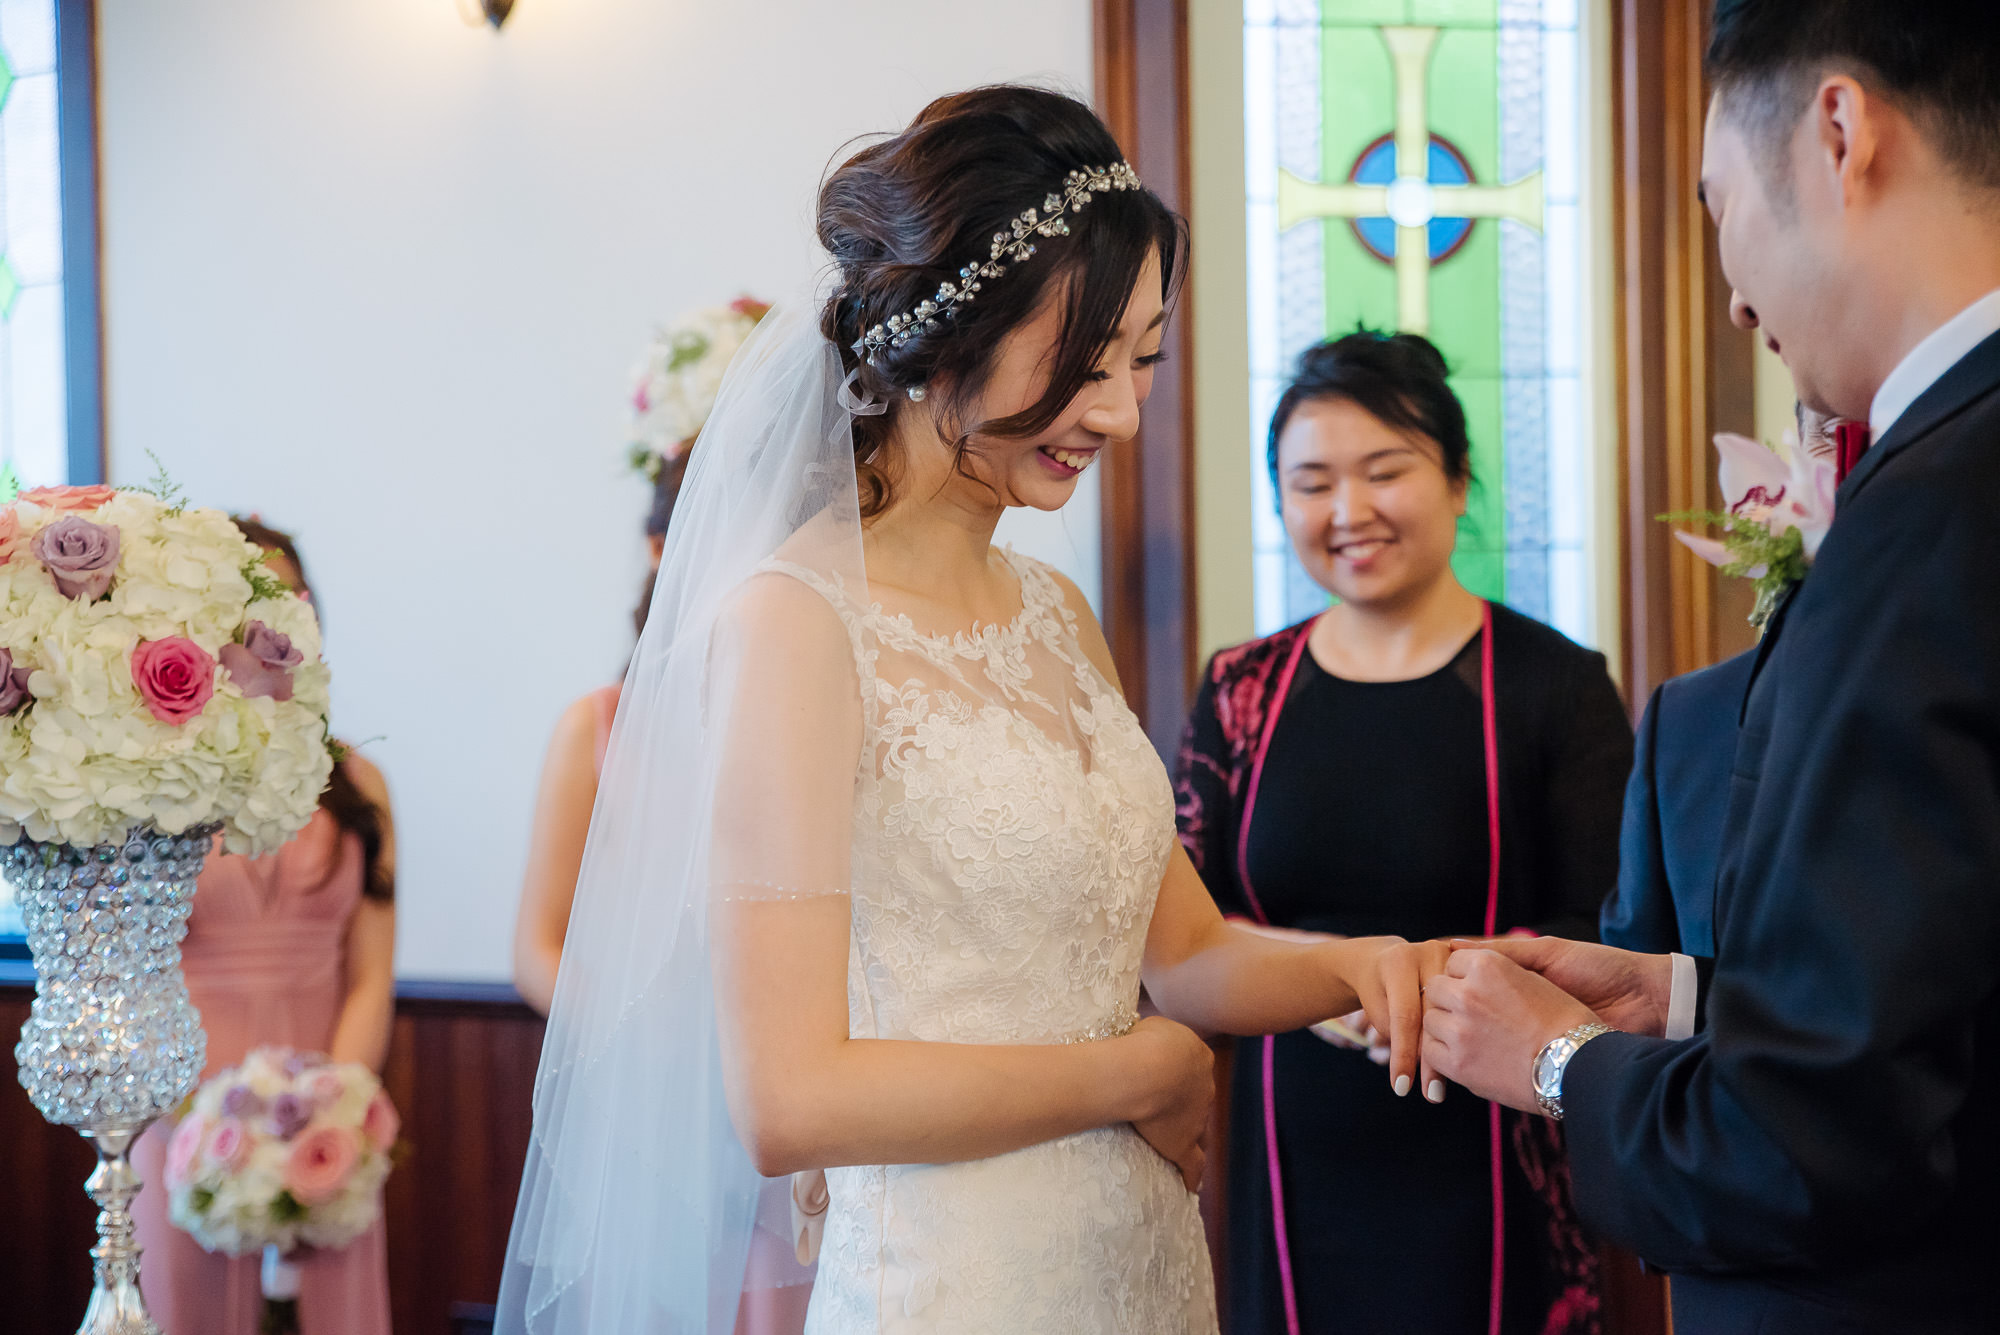 minoru_chapel_richmond_wedding_ceremony 1619379.jpg